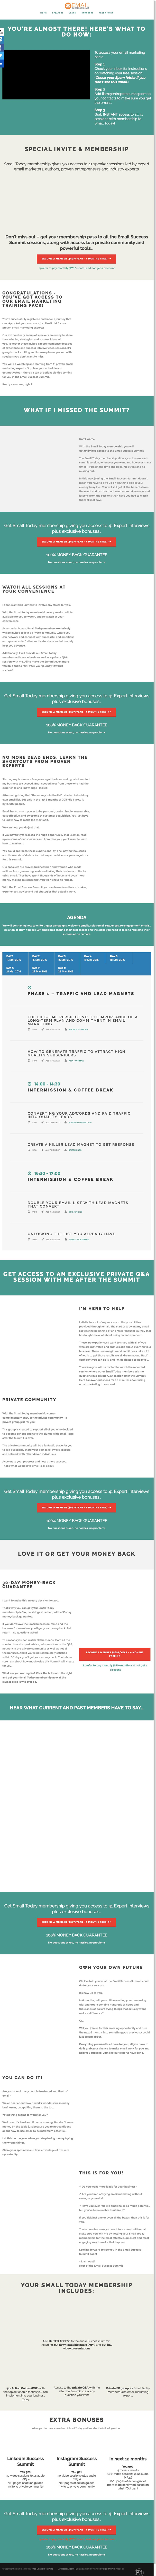 Email Success Summit